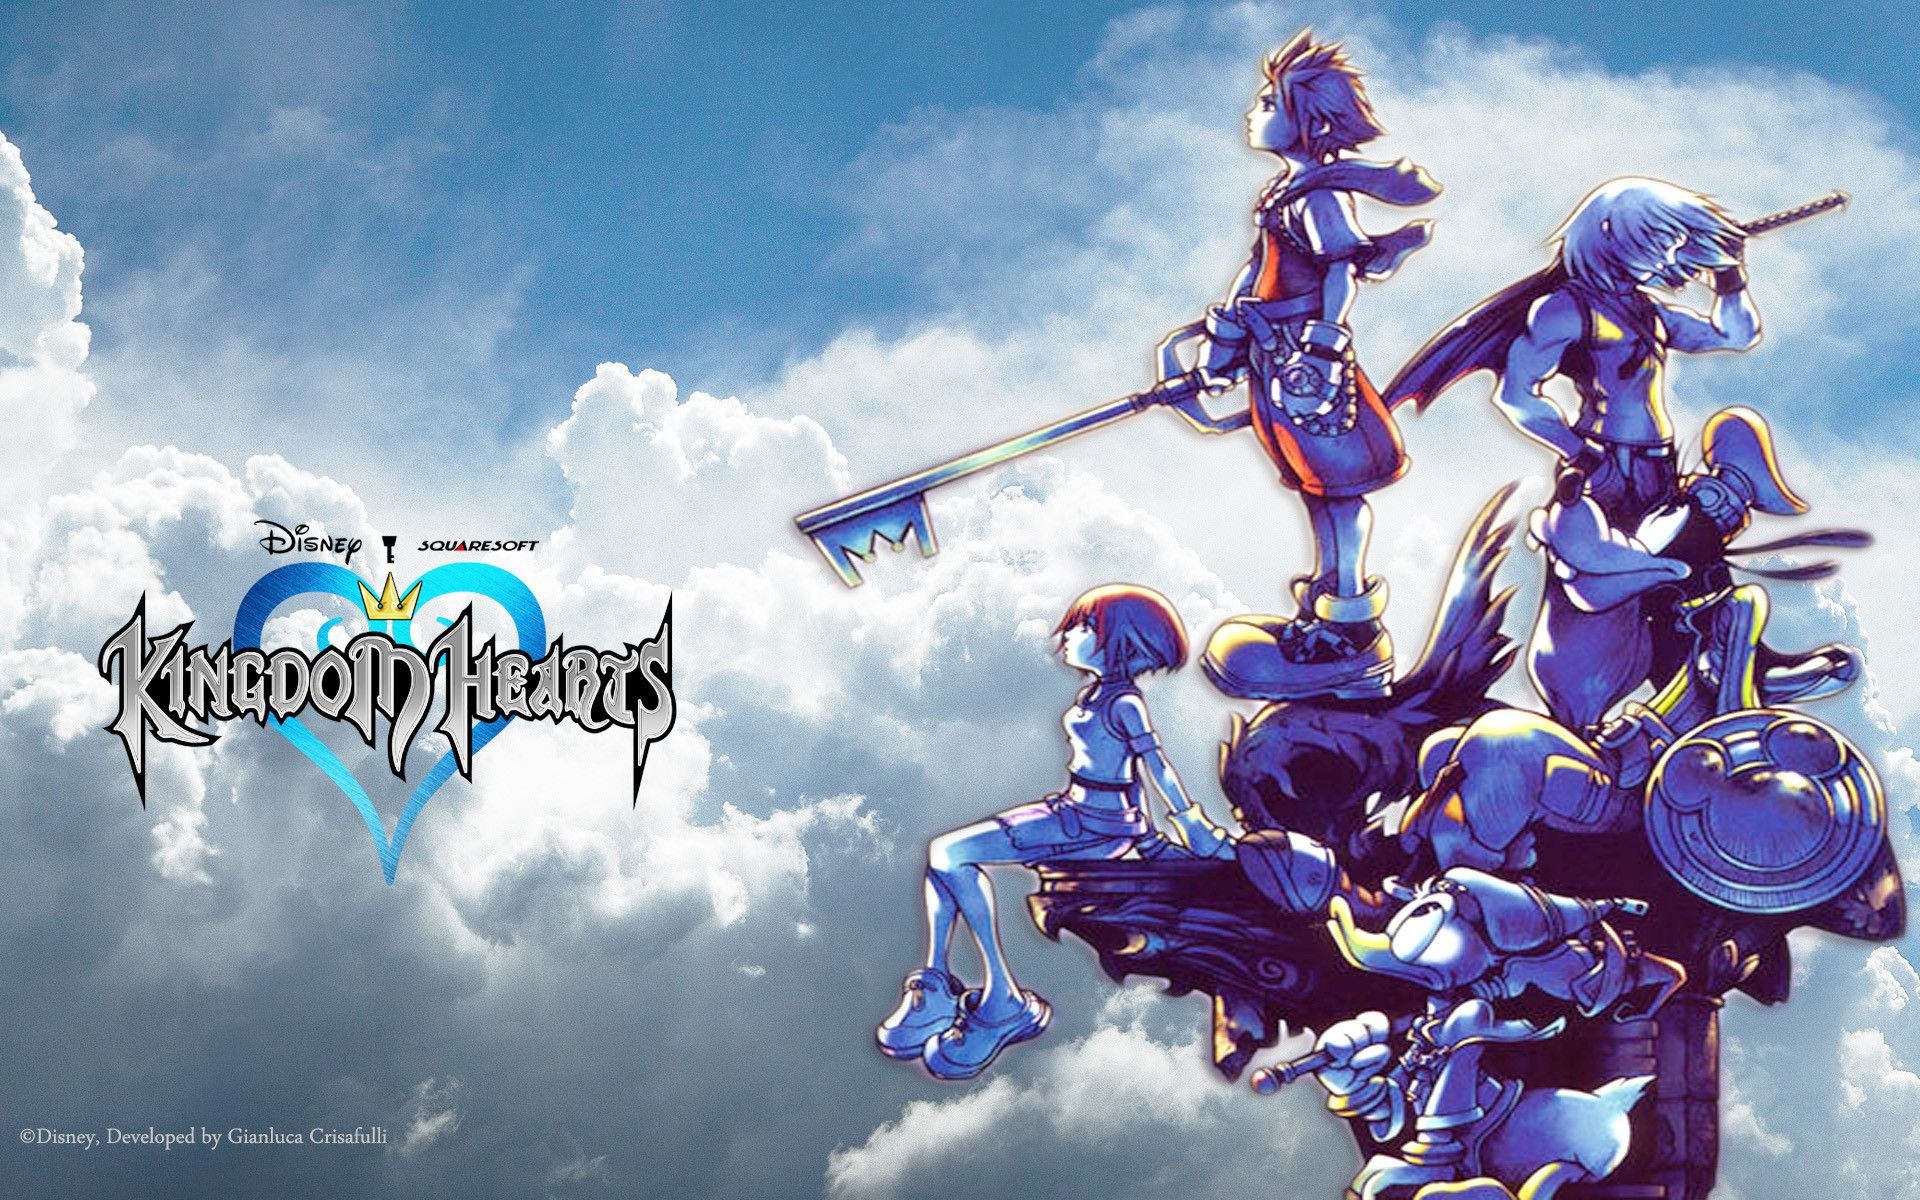 Kingdom Hearts Wallpapers   Full HD wallpaper search 1920x1200